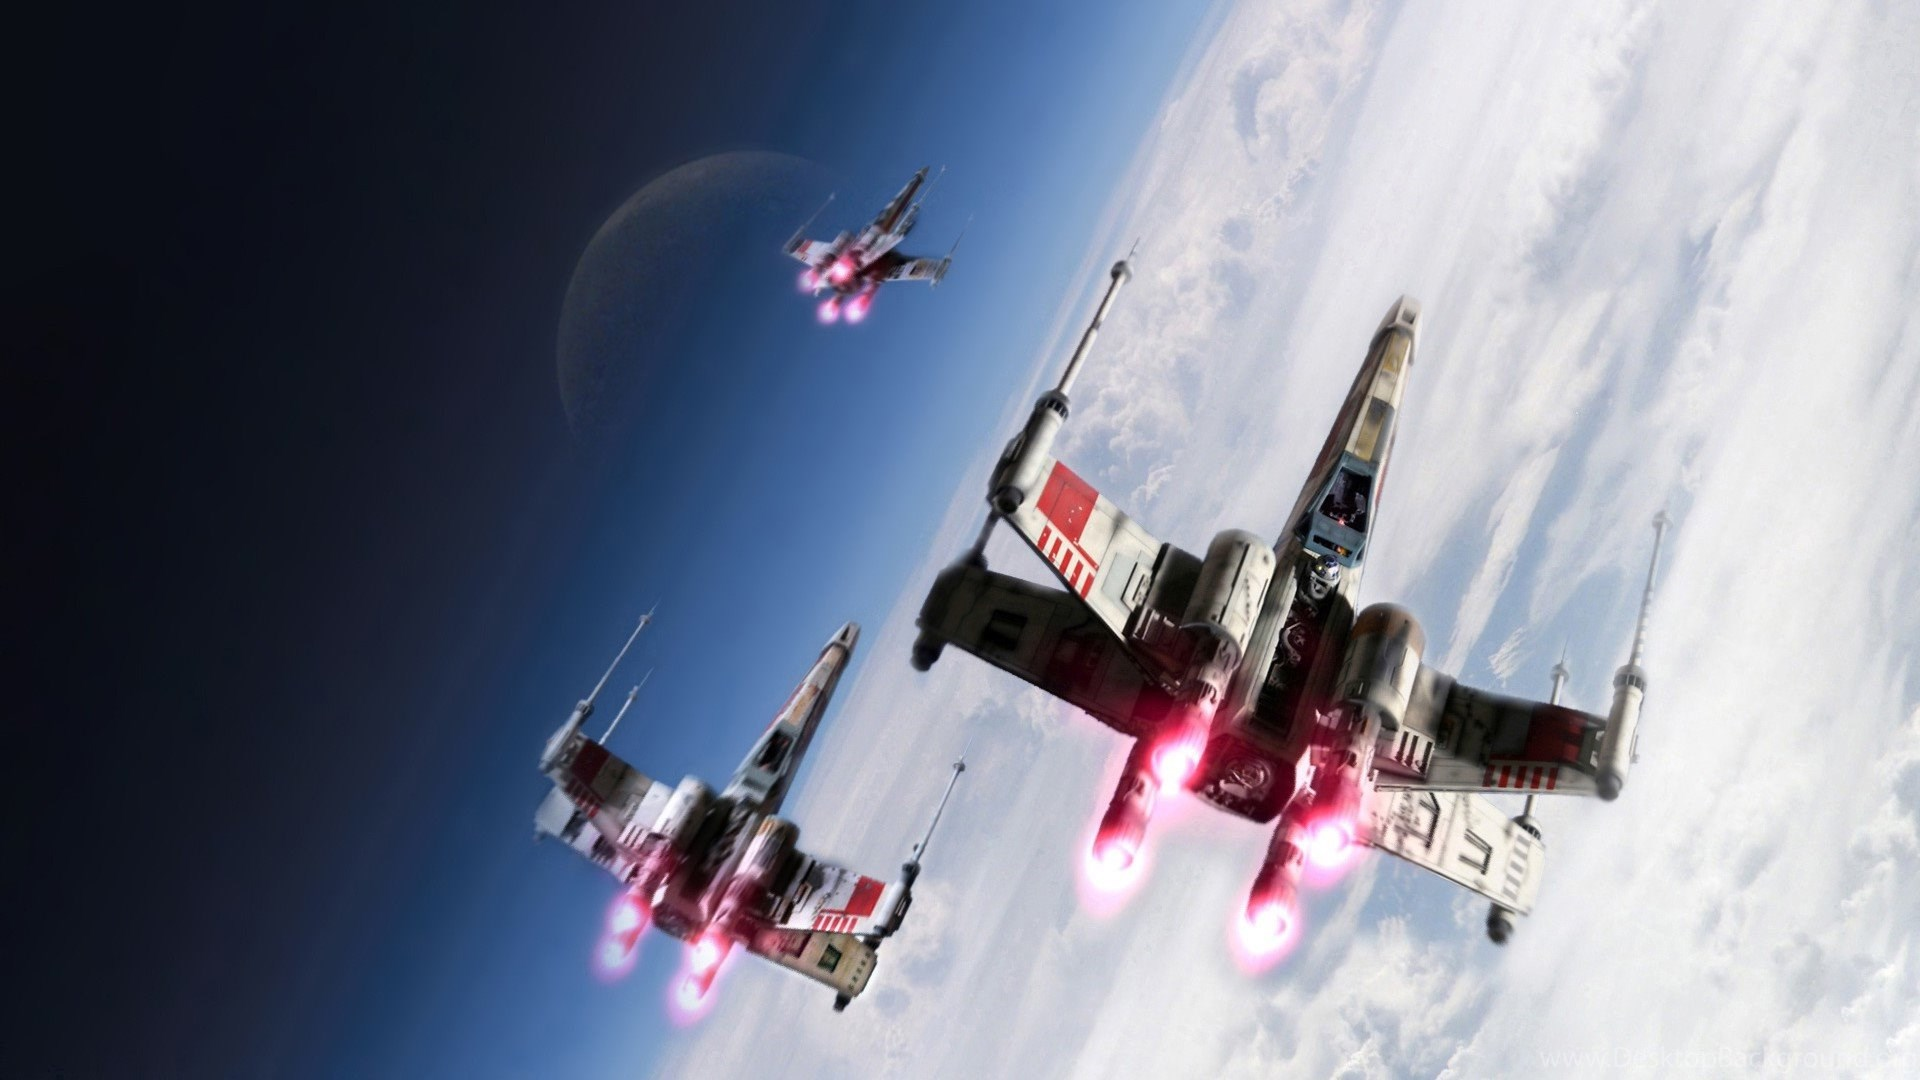 X Wing Star Wars Rebel Alliance Wallpapers Hd Desktop And